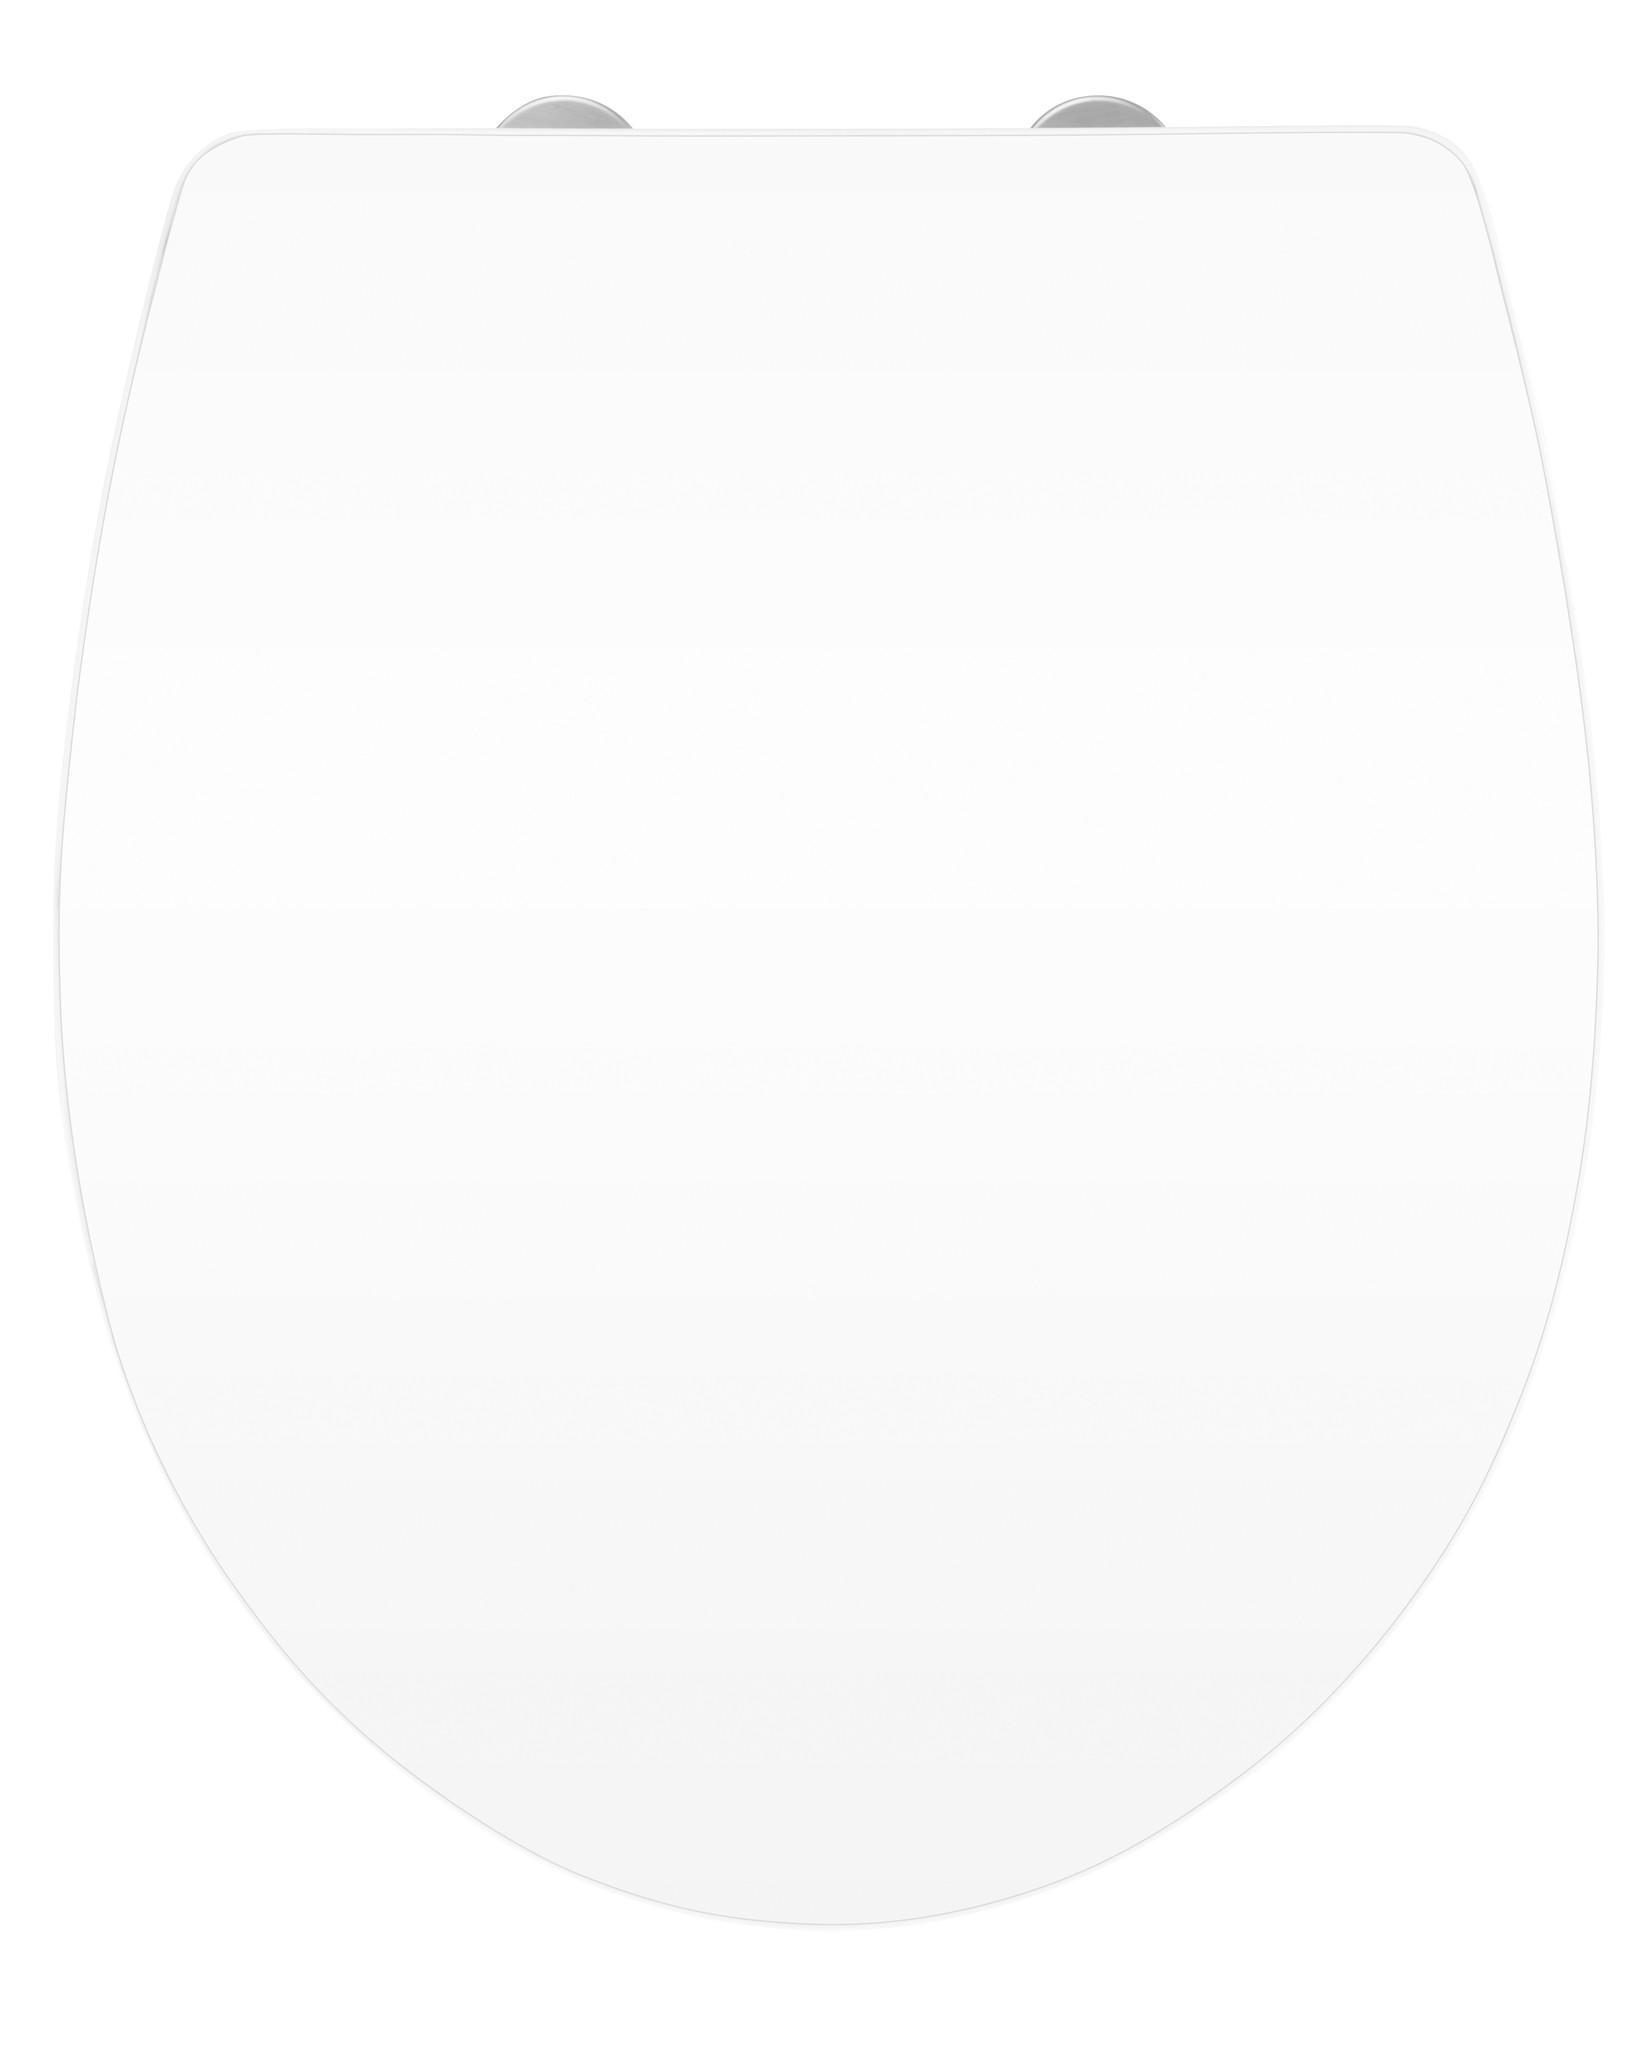 WC-Sitz Hochglanz Acryl White, Absenkautomatik, Fix-Clip Hygiene Befestigung